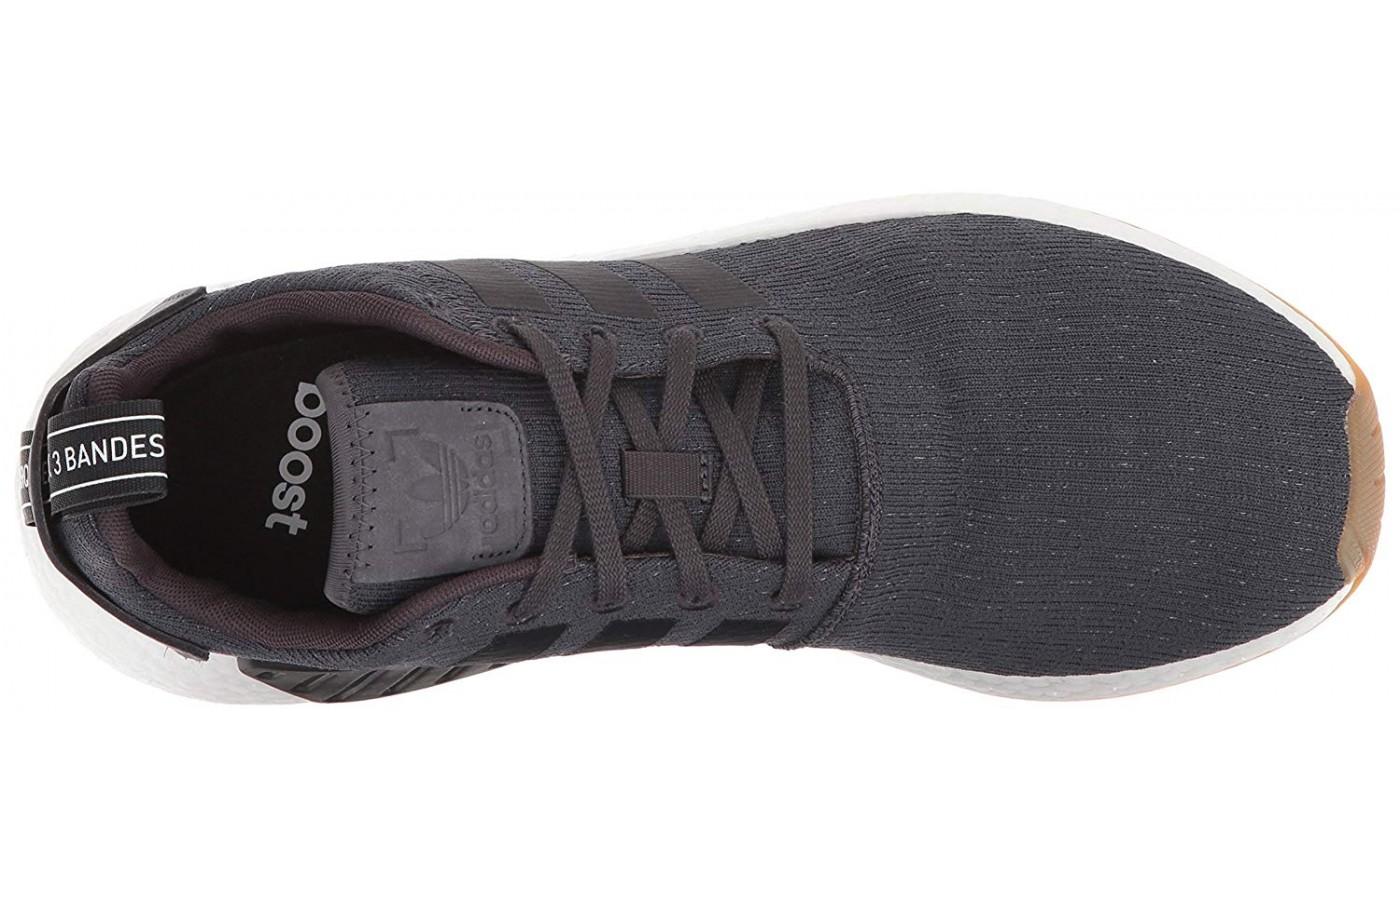 Adidas NMD_R2  upper